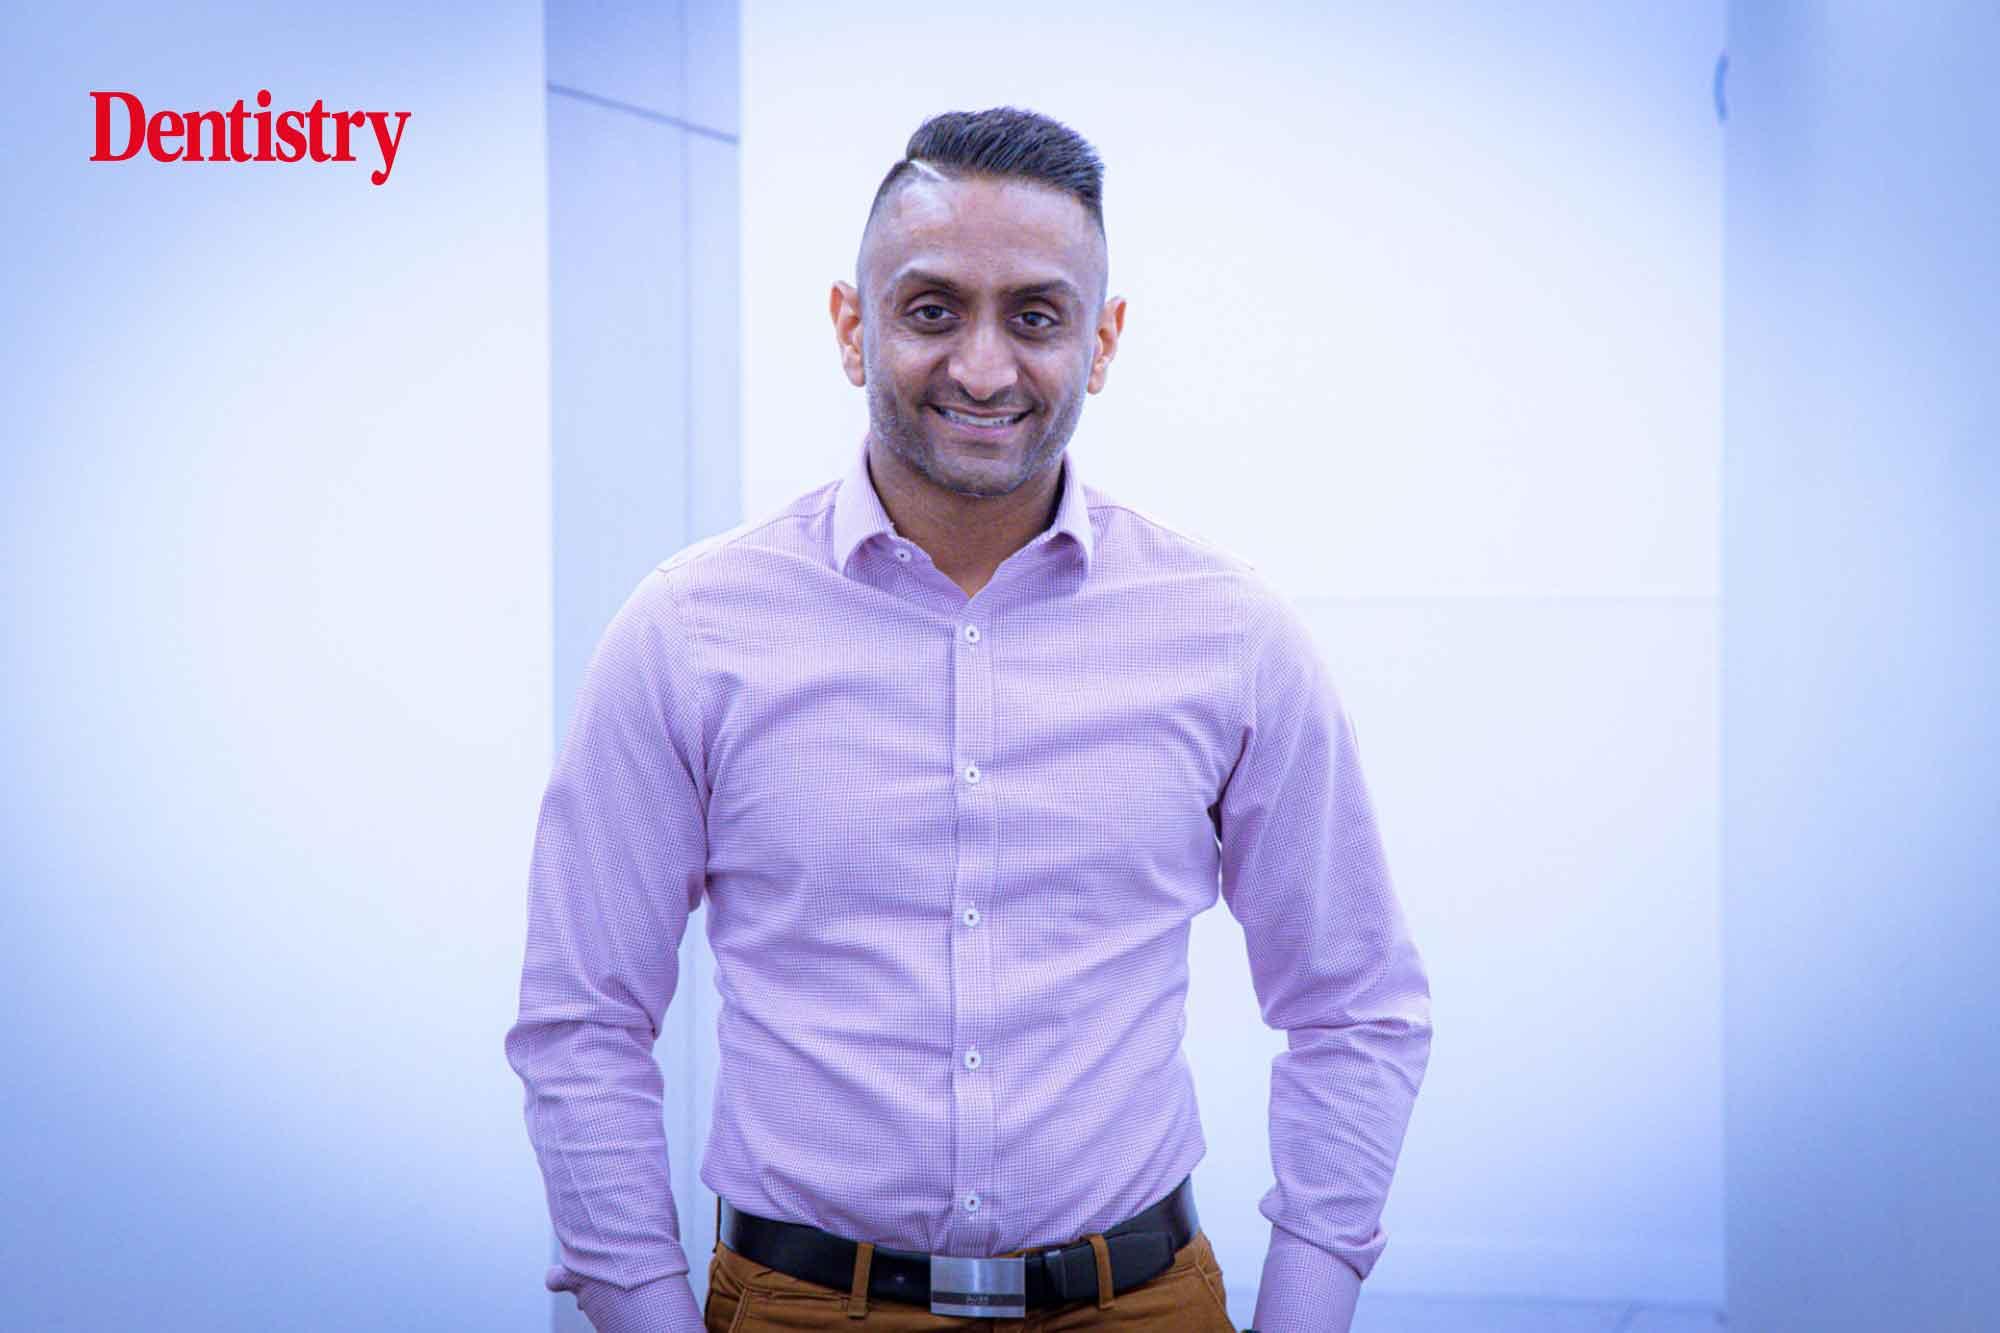 Litigation in dentistry